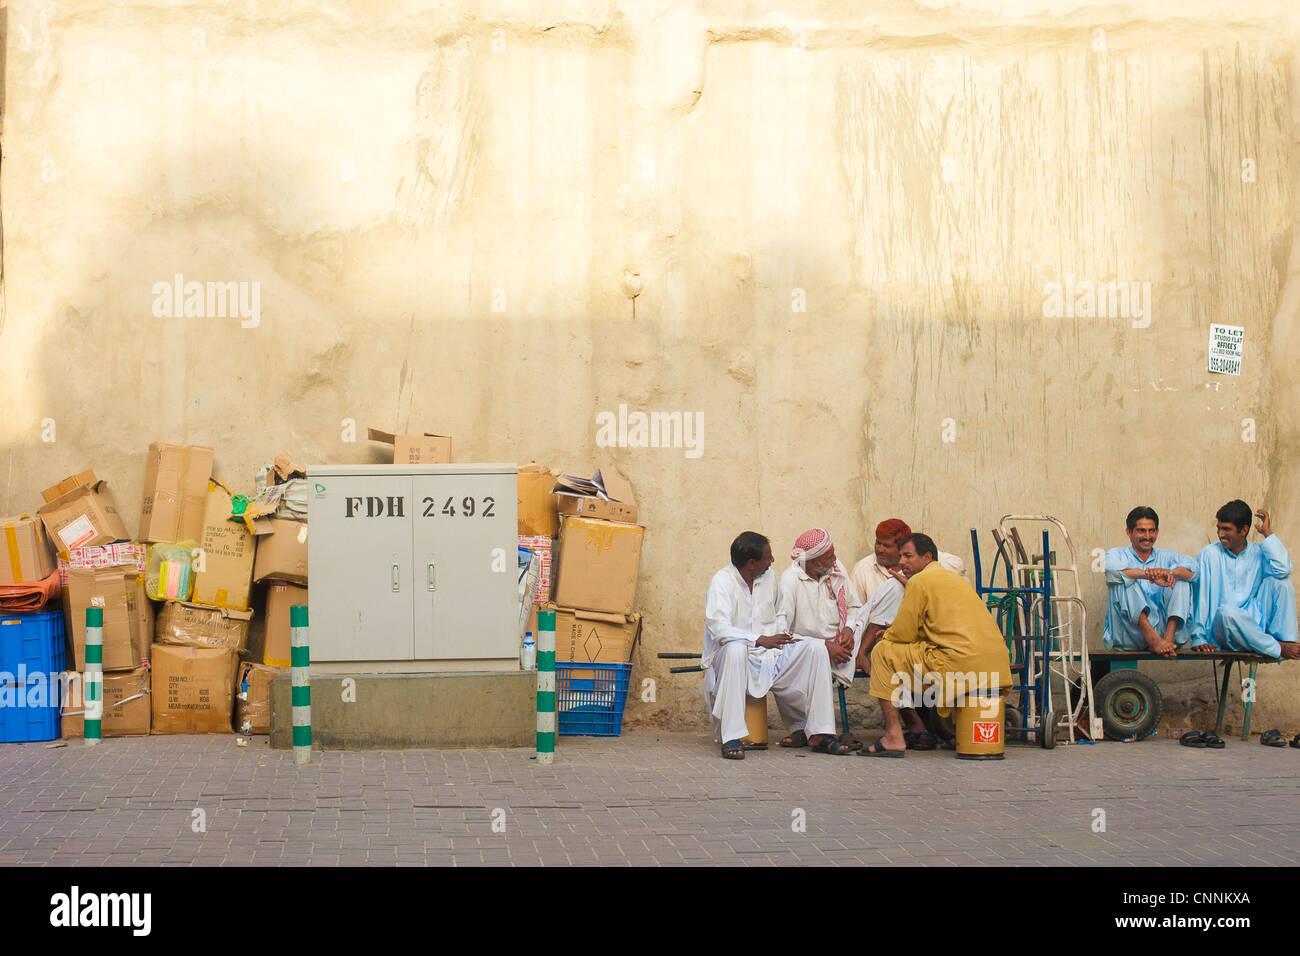 dubai spice souk, deira - Stock Image